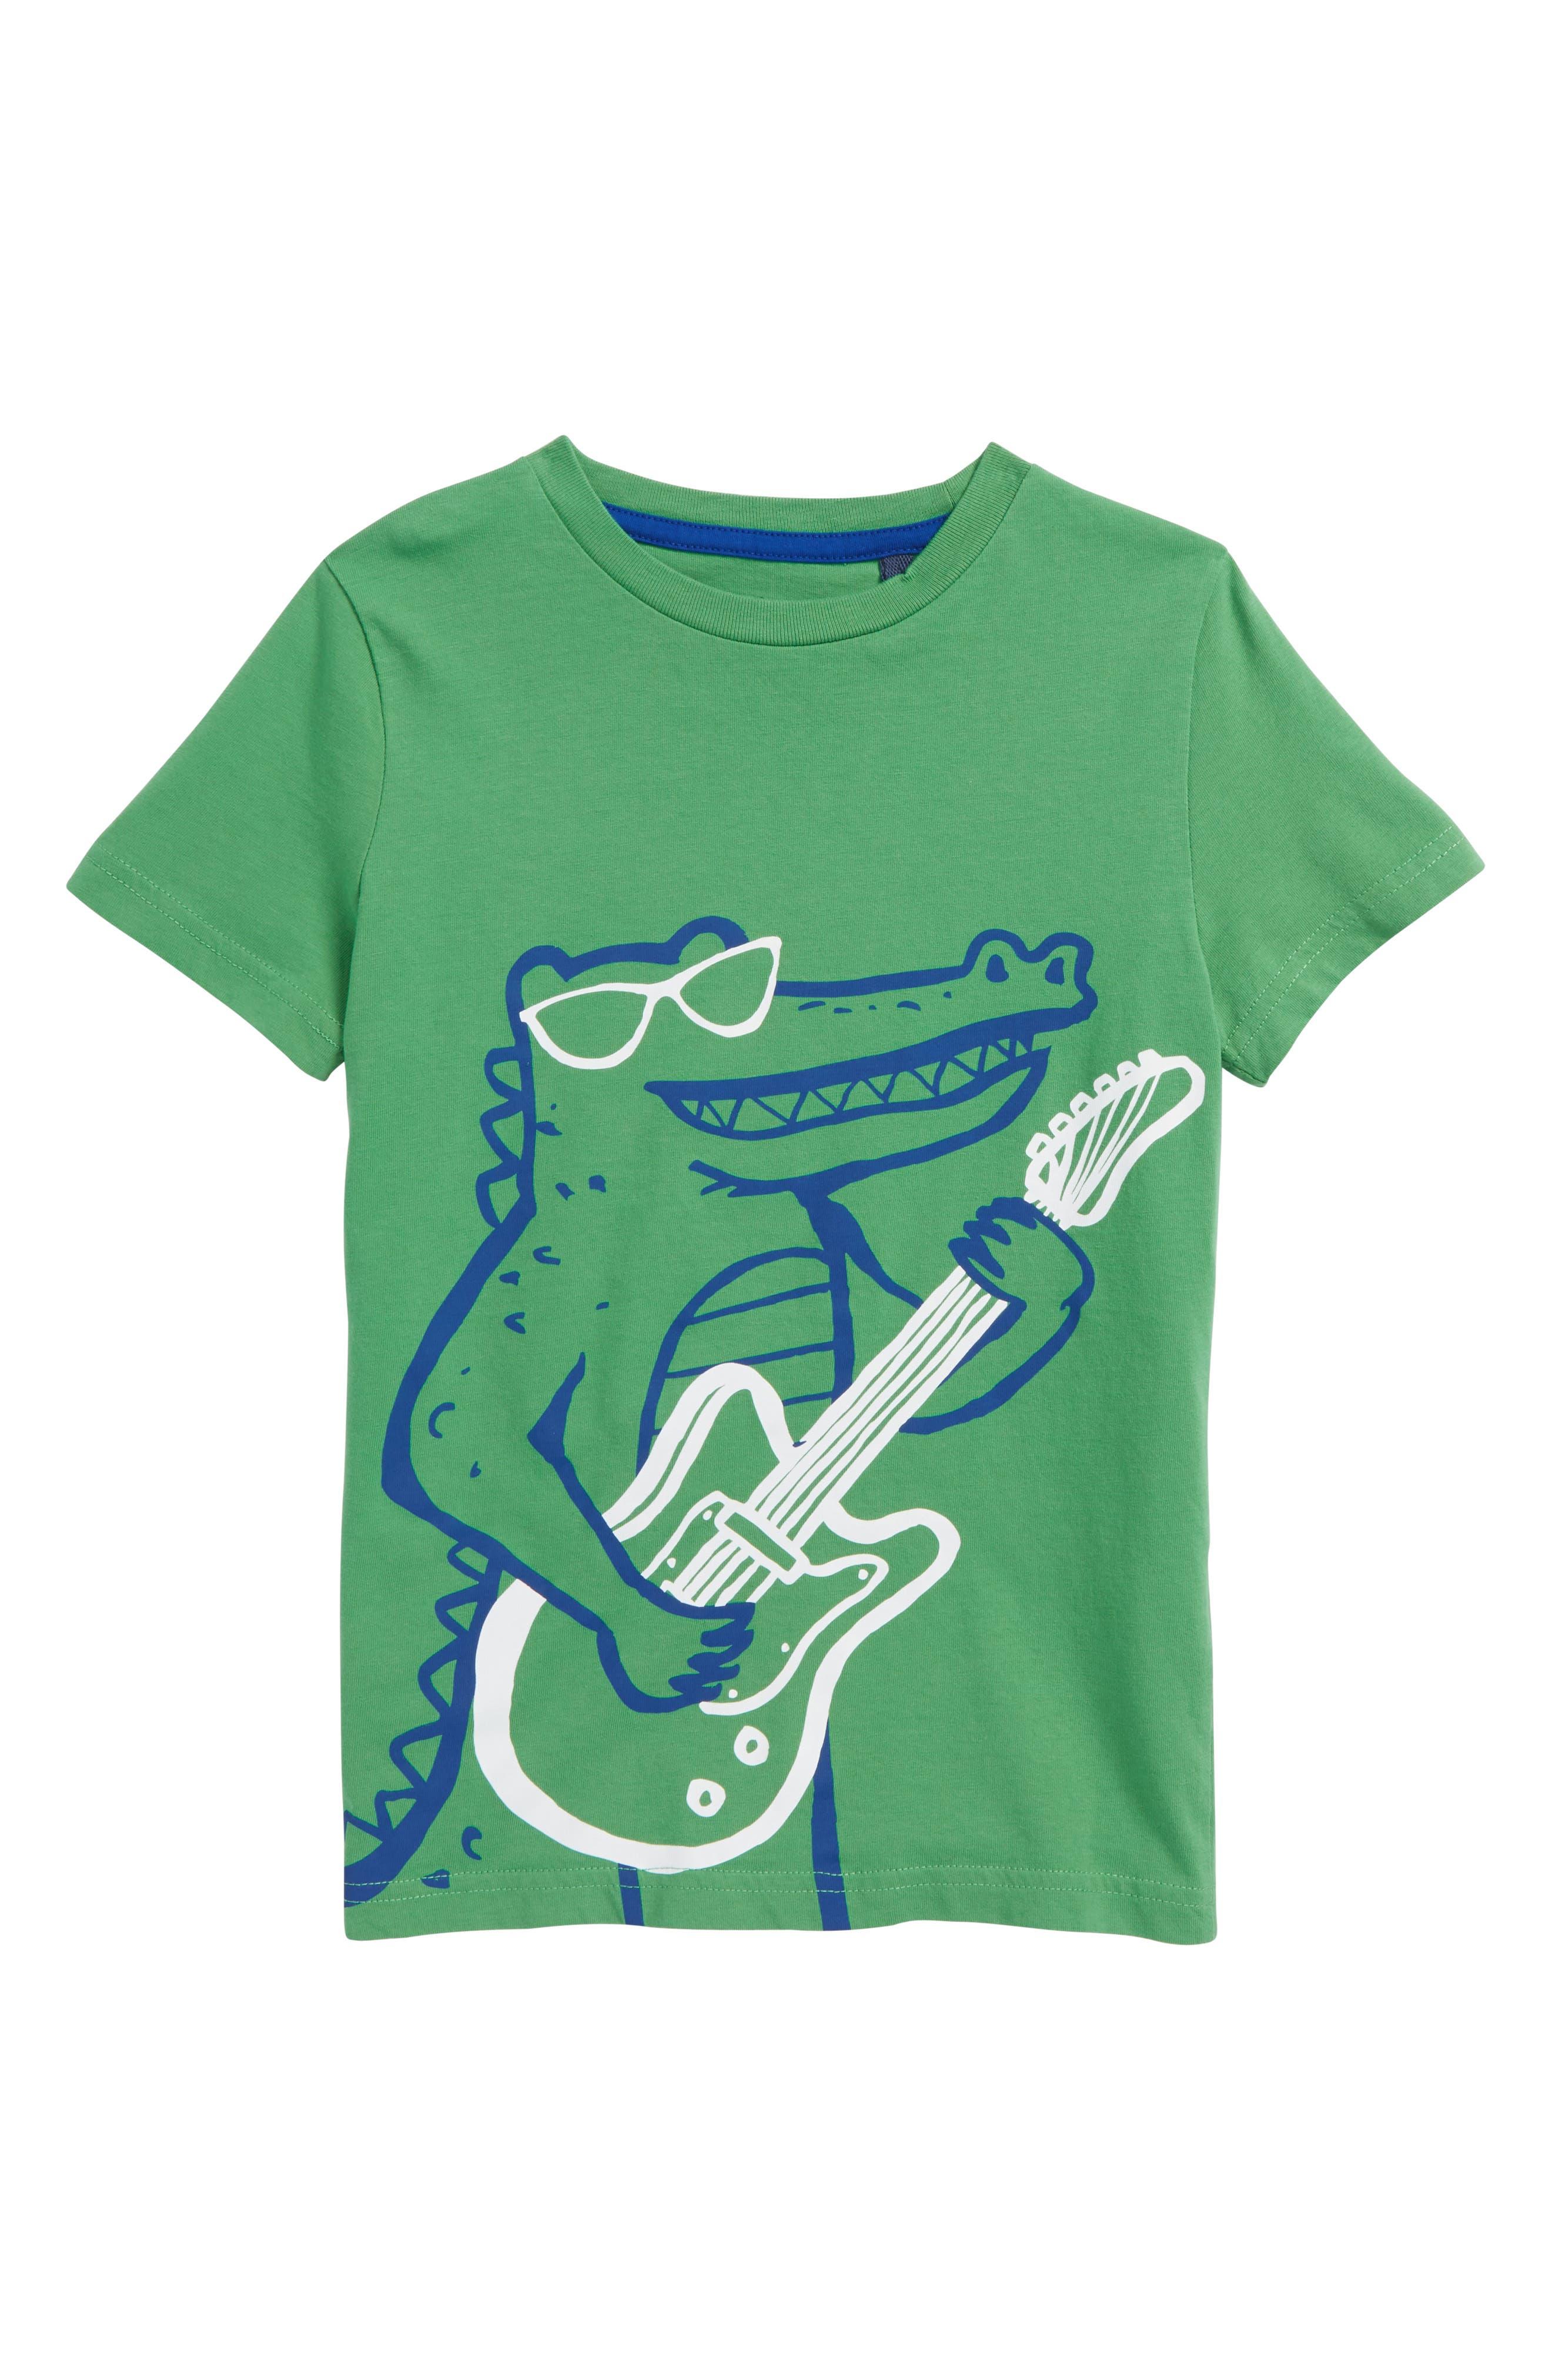 Arty Croc T-Shirt,                         Main,                         color, Iguana Green Croc